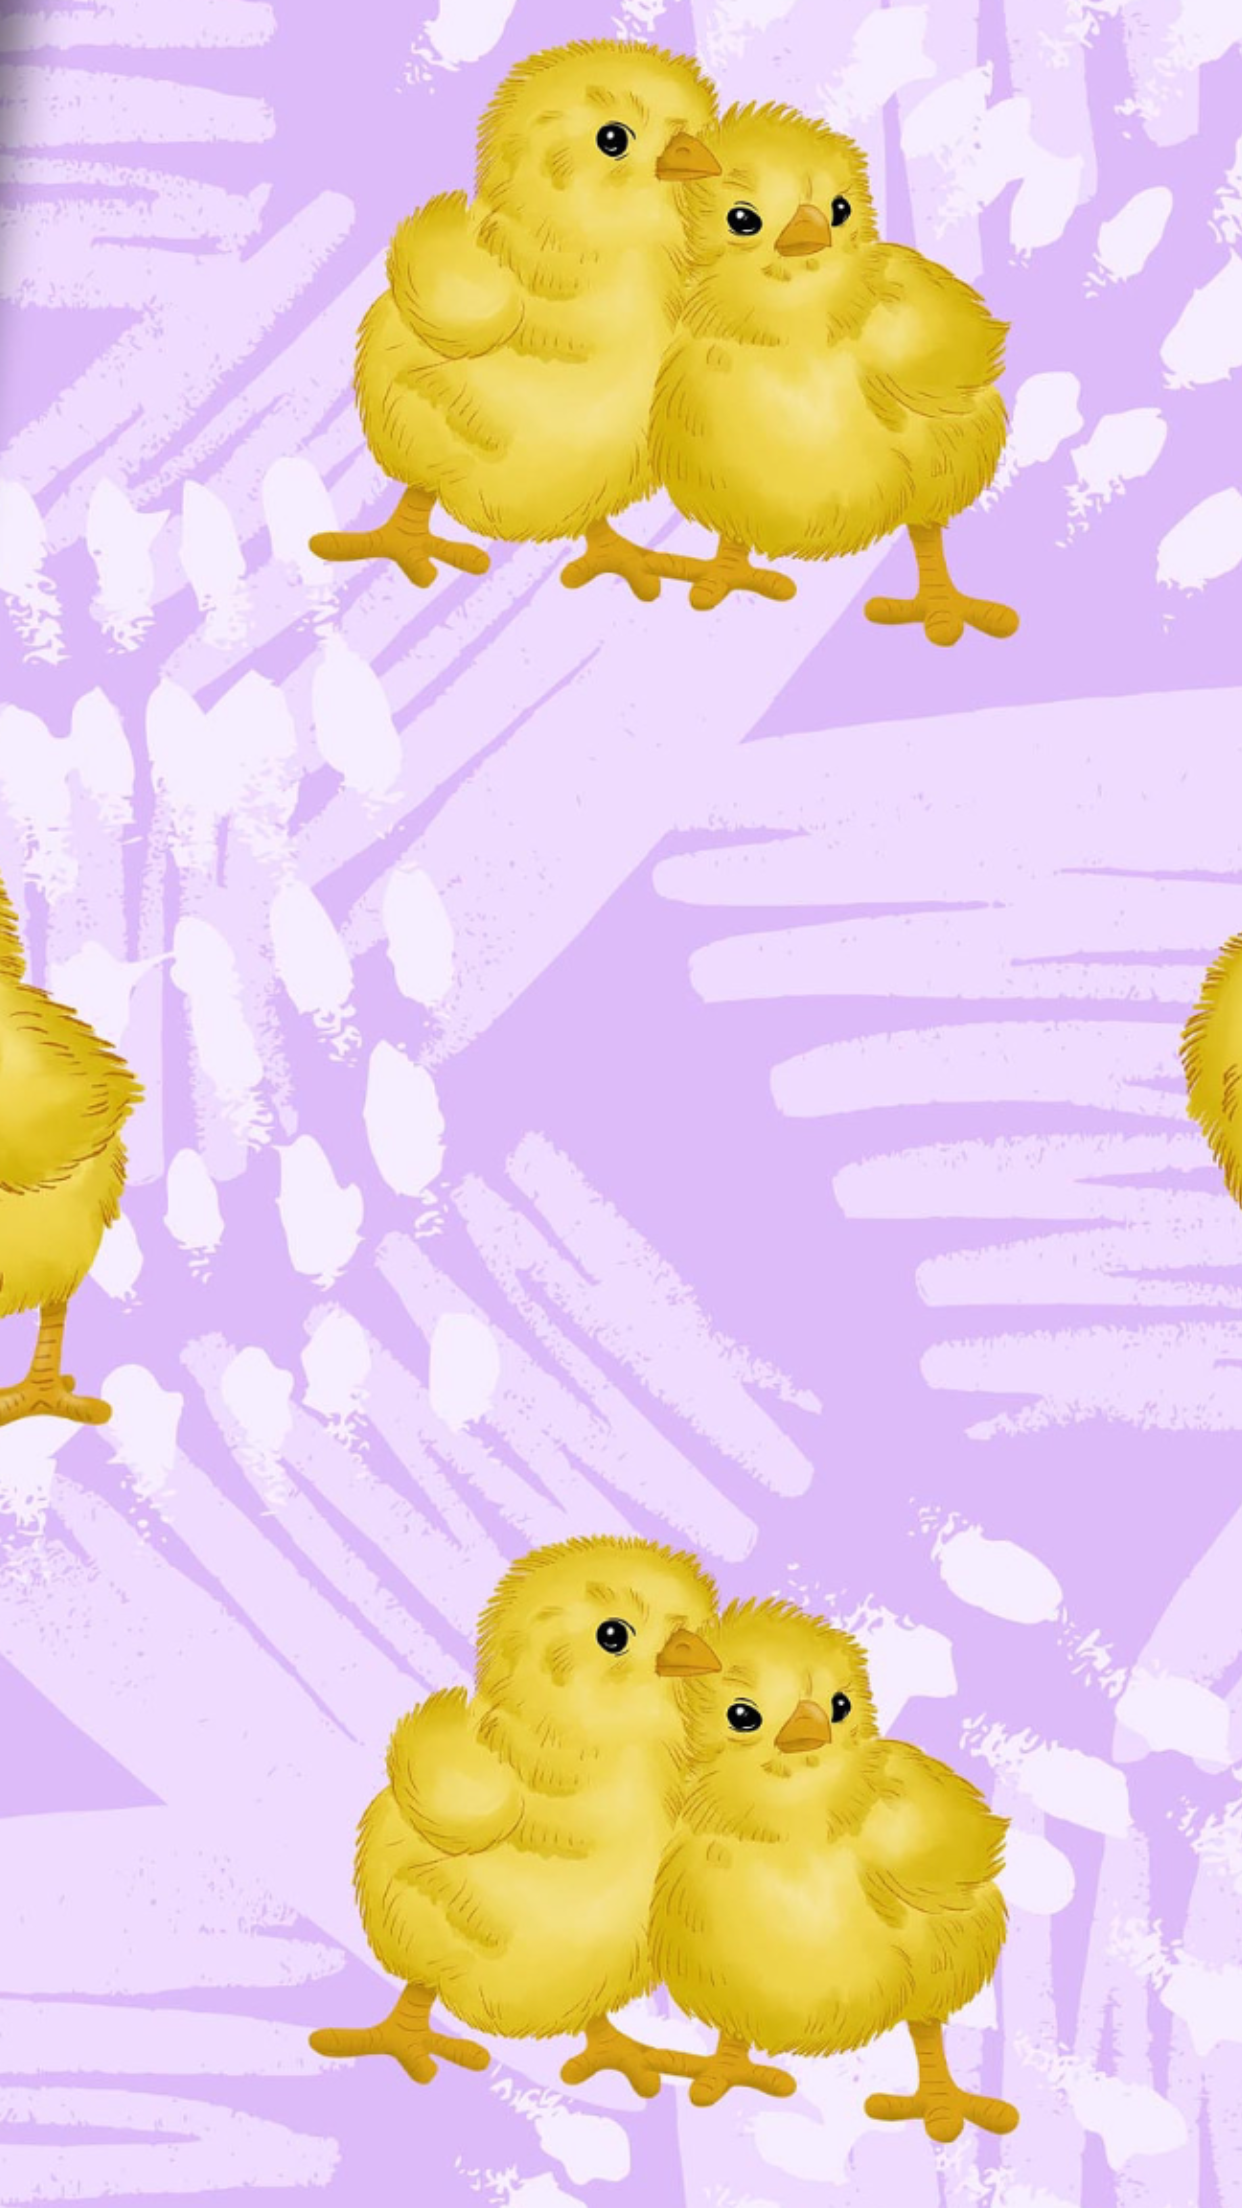 Pin by Corina Conduto on Easter wallpaper Pinterest